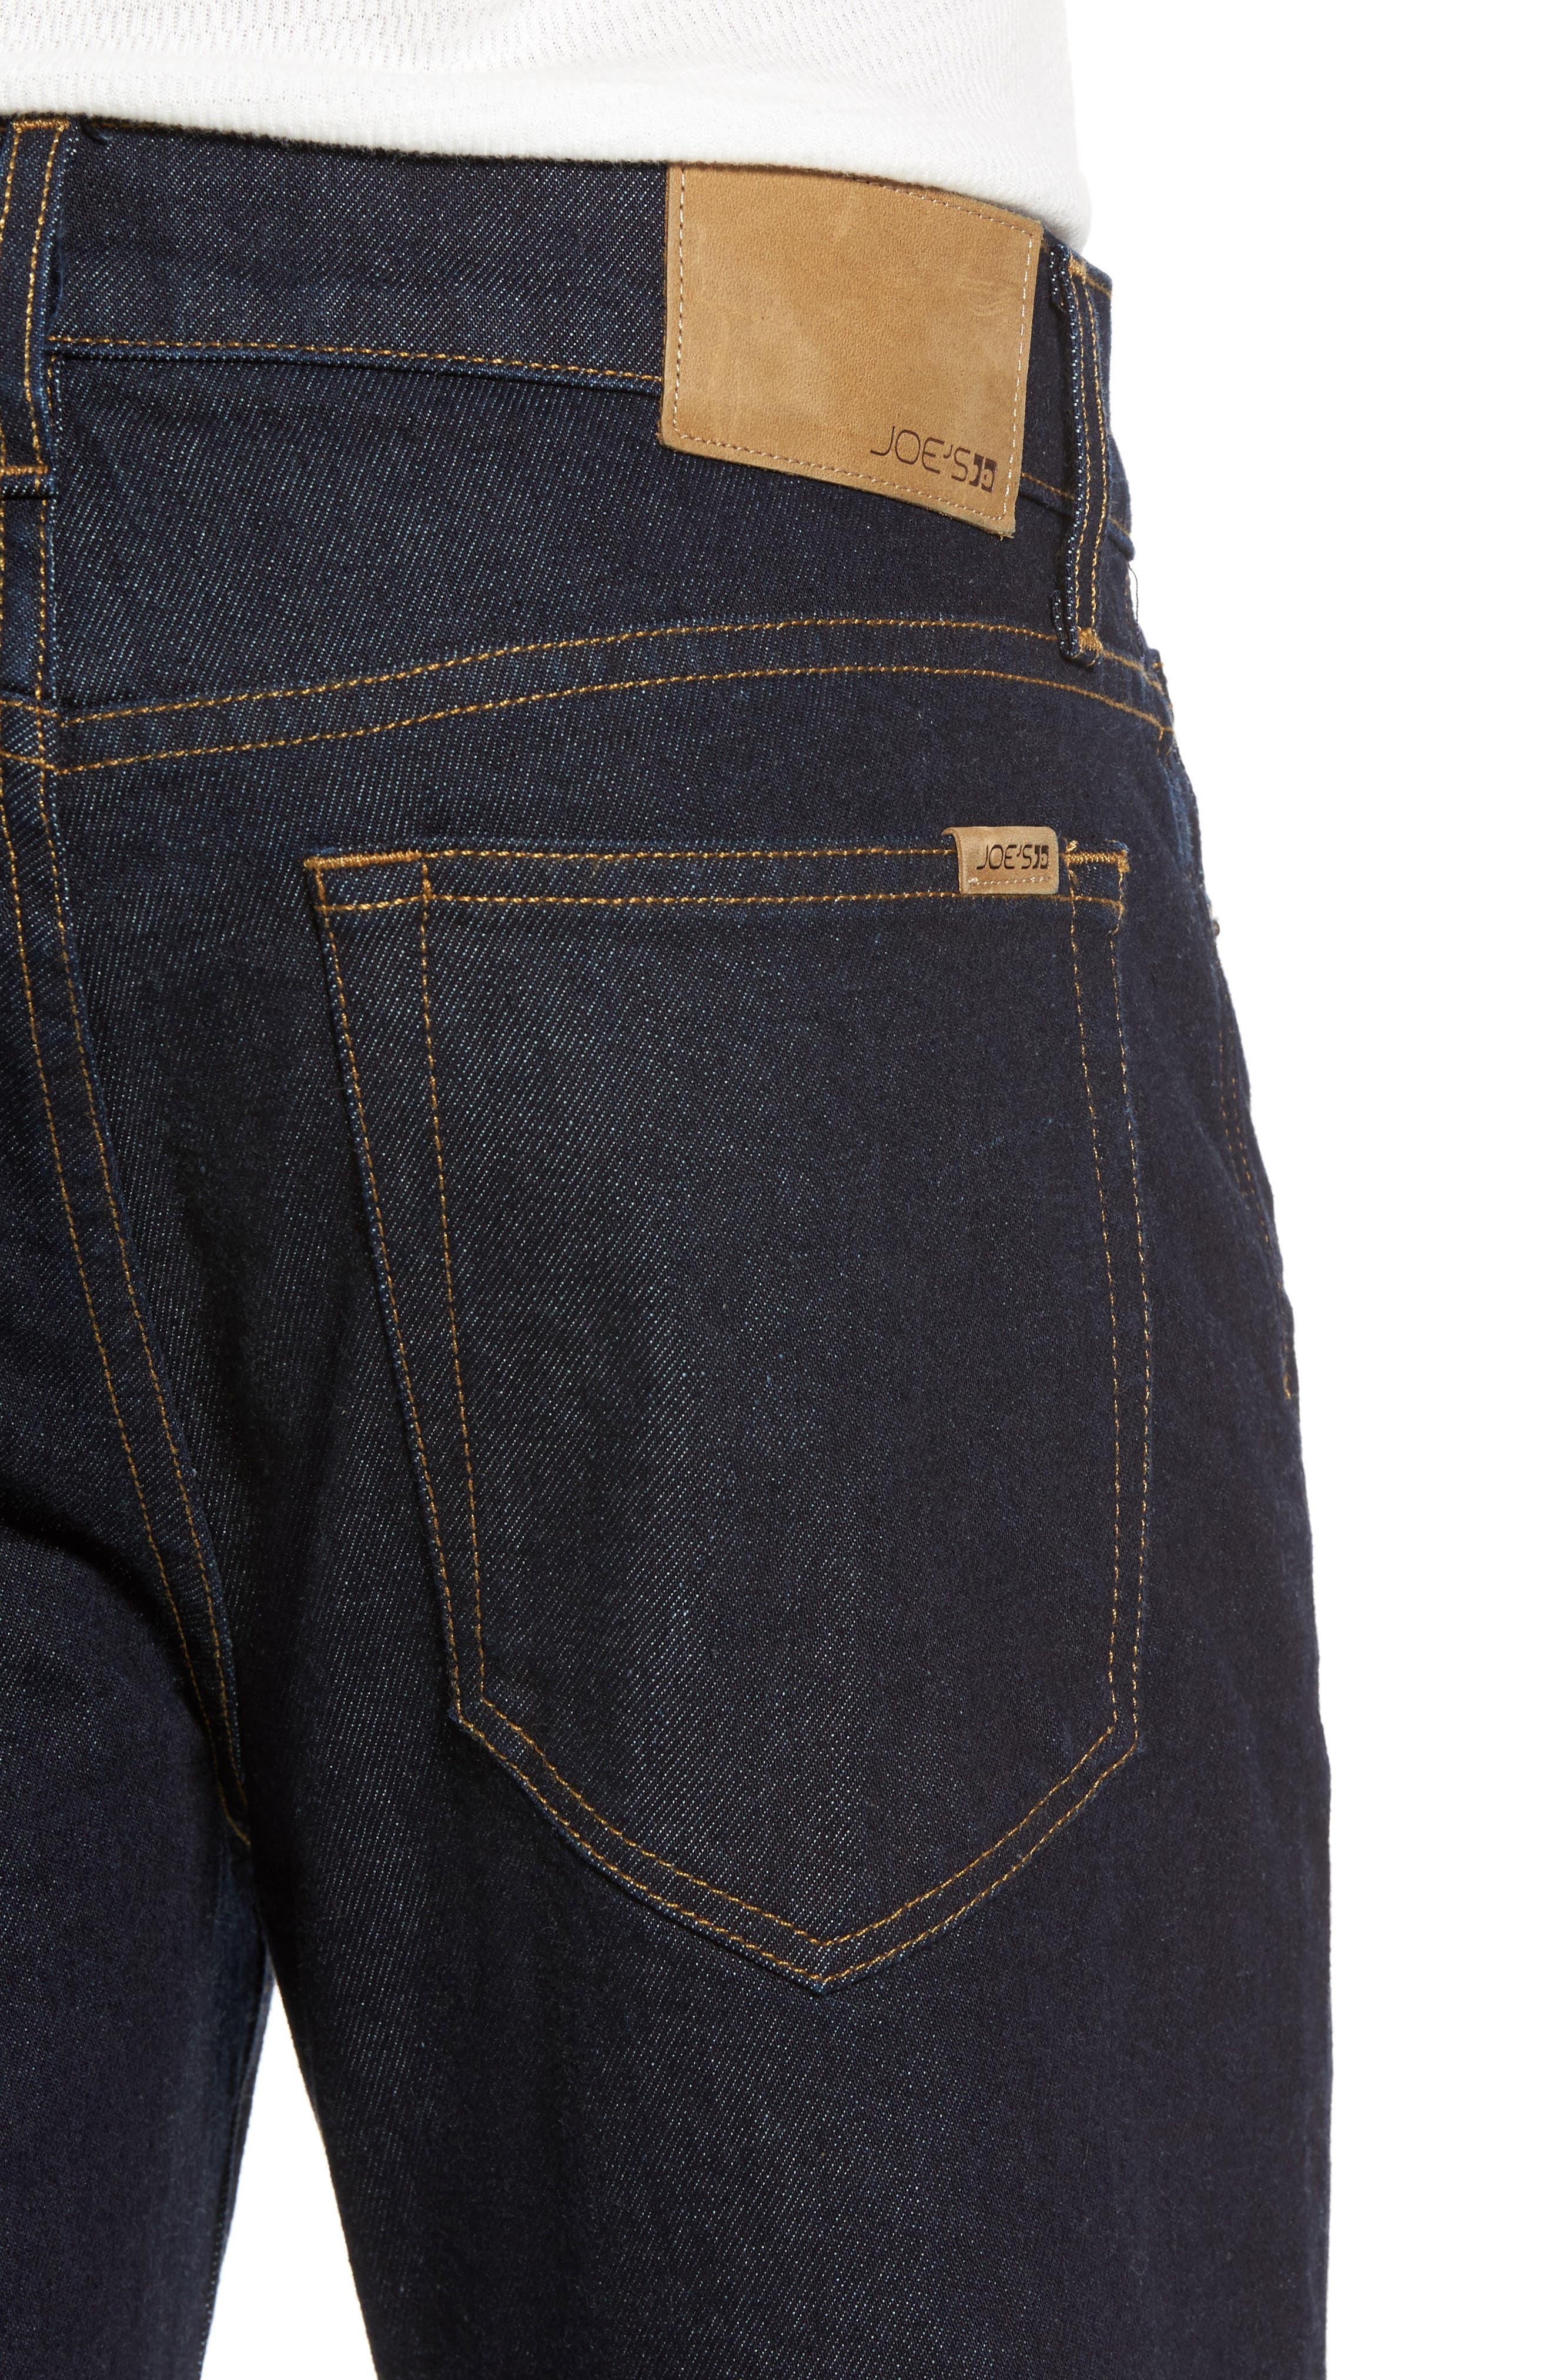 Brixton Slim Straight Leg Jeans,                             Alternate thumbnail 4, color,                             400